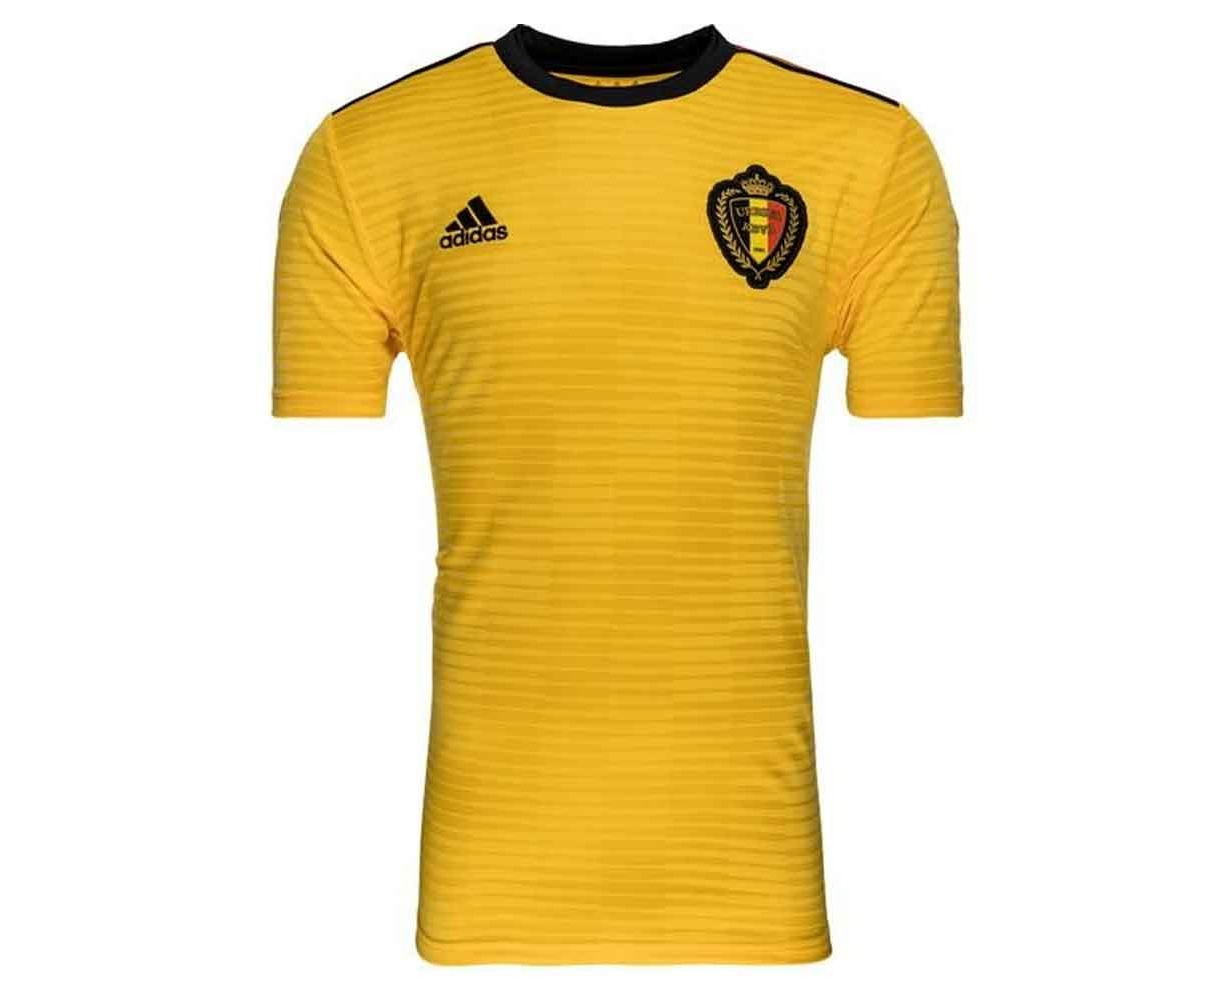 3be354e0fcc 2018-2019 Belgium Away Adidas Football Shirt (Alderweireld 2) - Kids ...